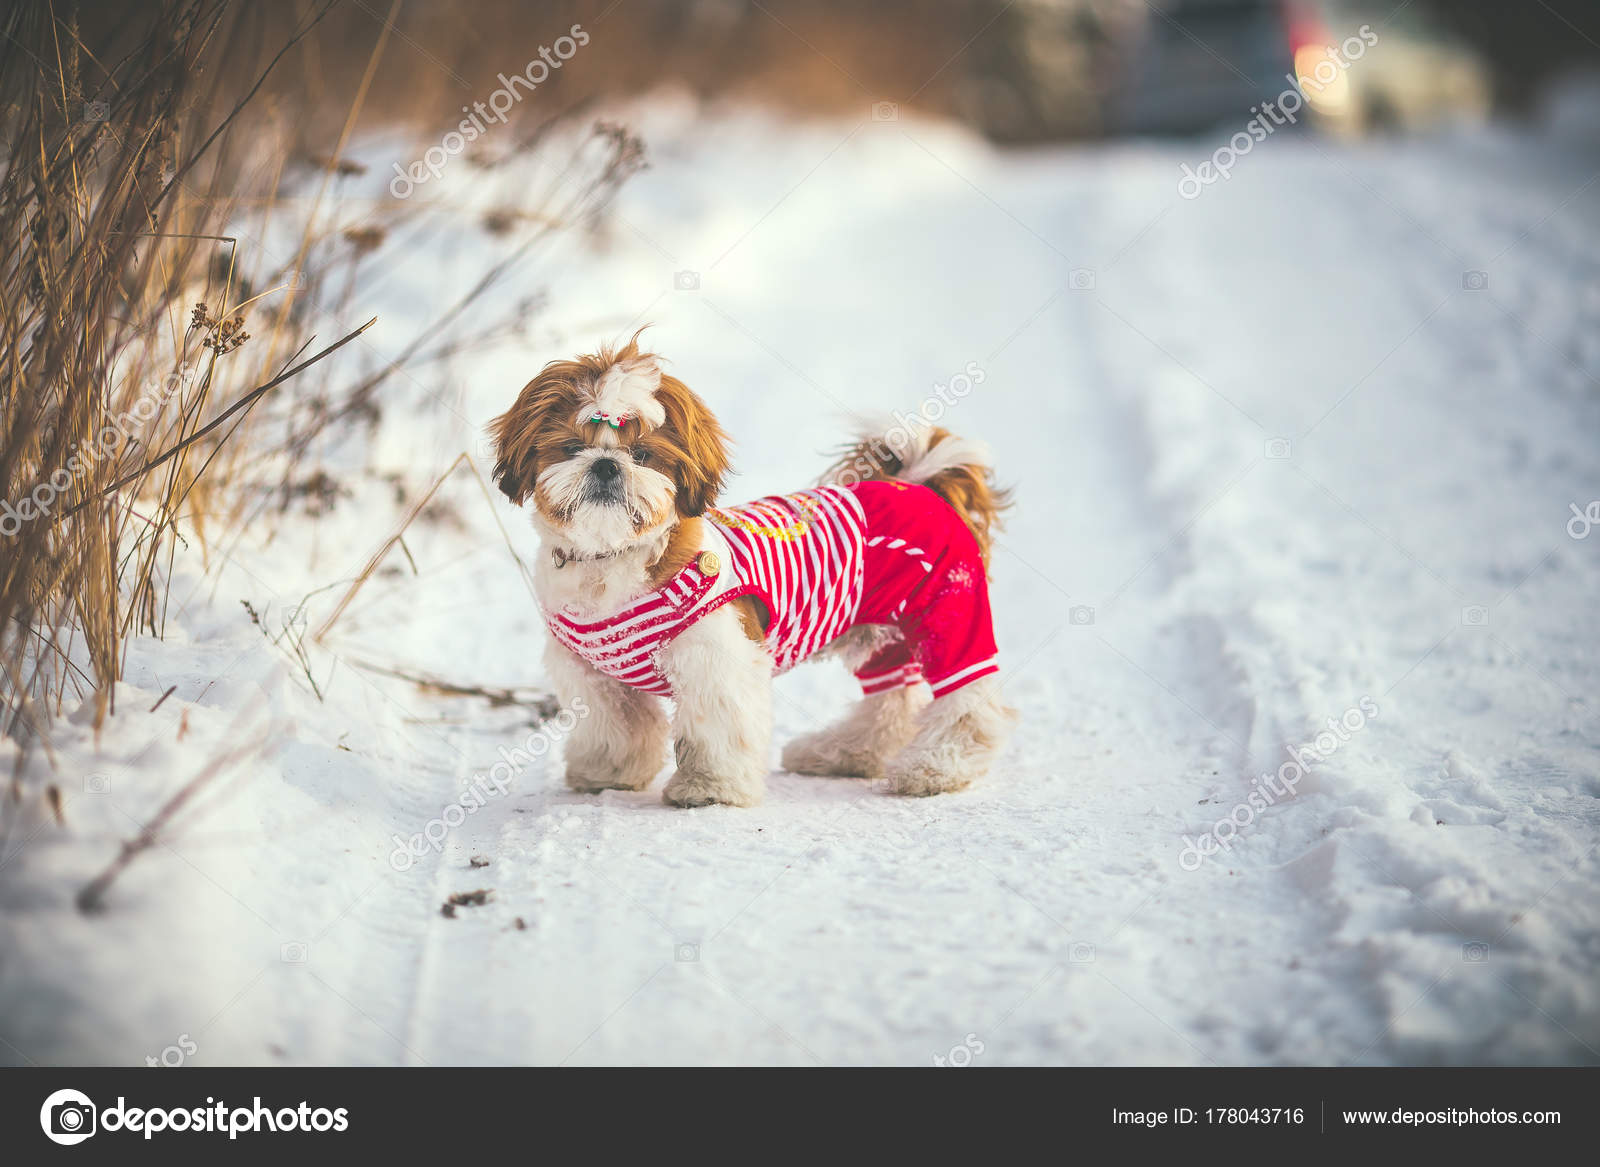 Pics Doc Holliday Winter Walk Snow Park Shih Tzu Puppy Clothes Stock Photo C Viclin 178043716